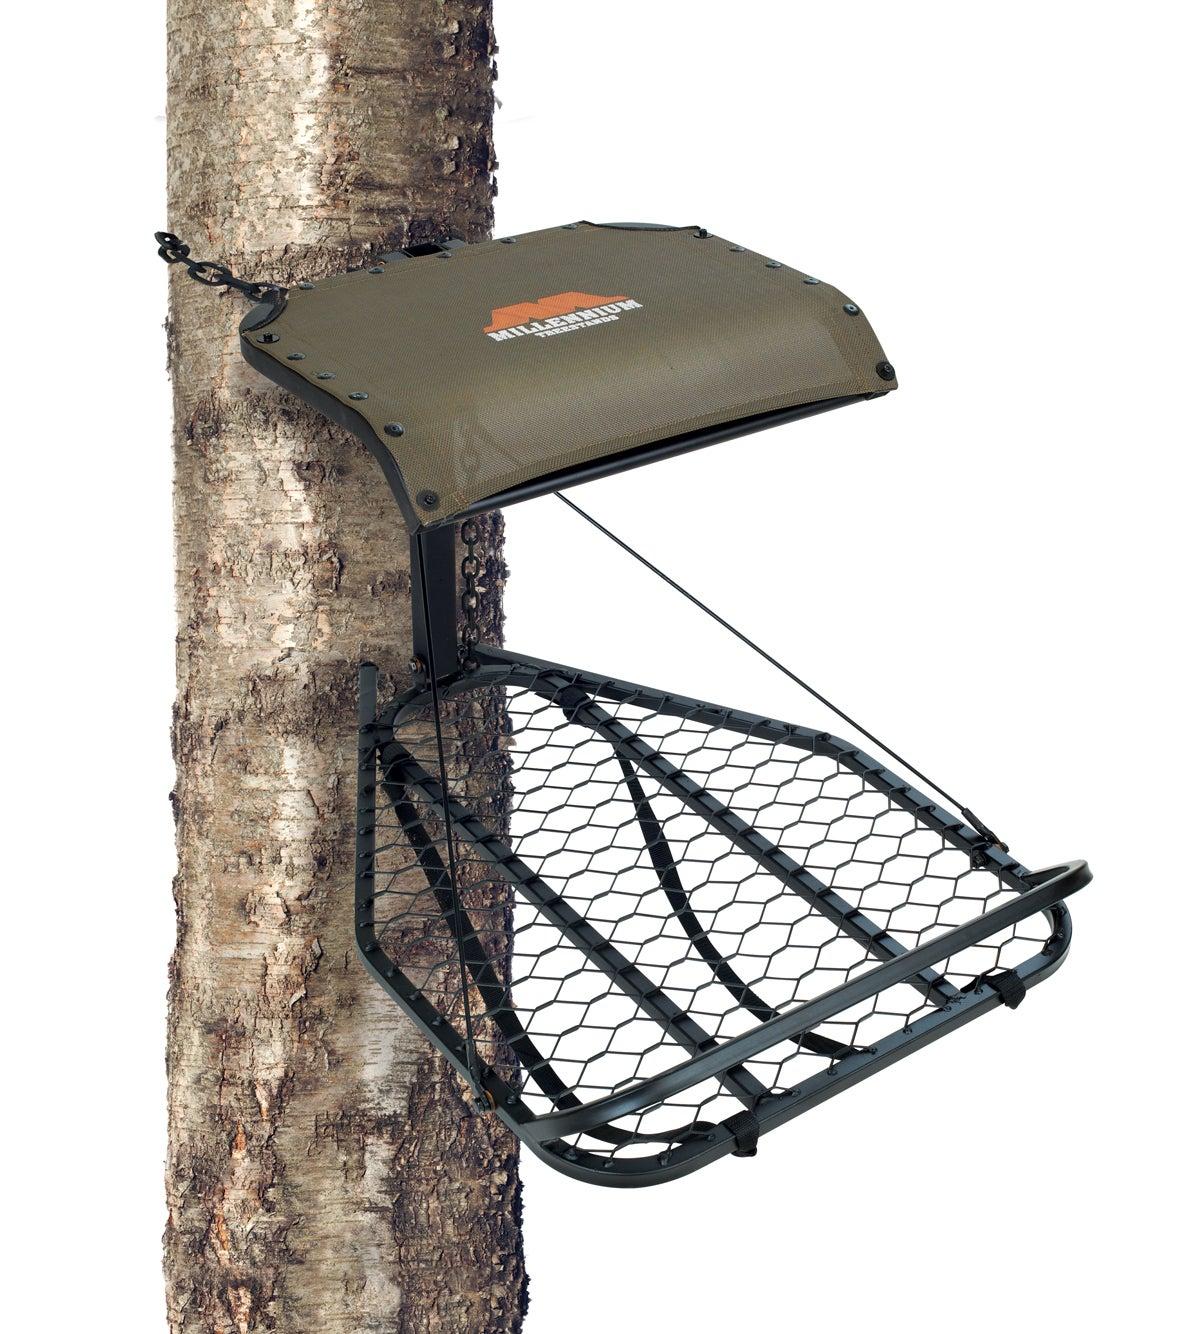 Field Test: Treestands for Under $100